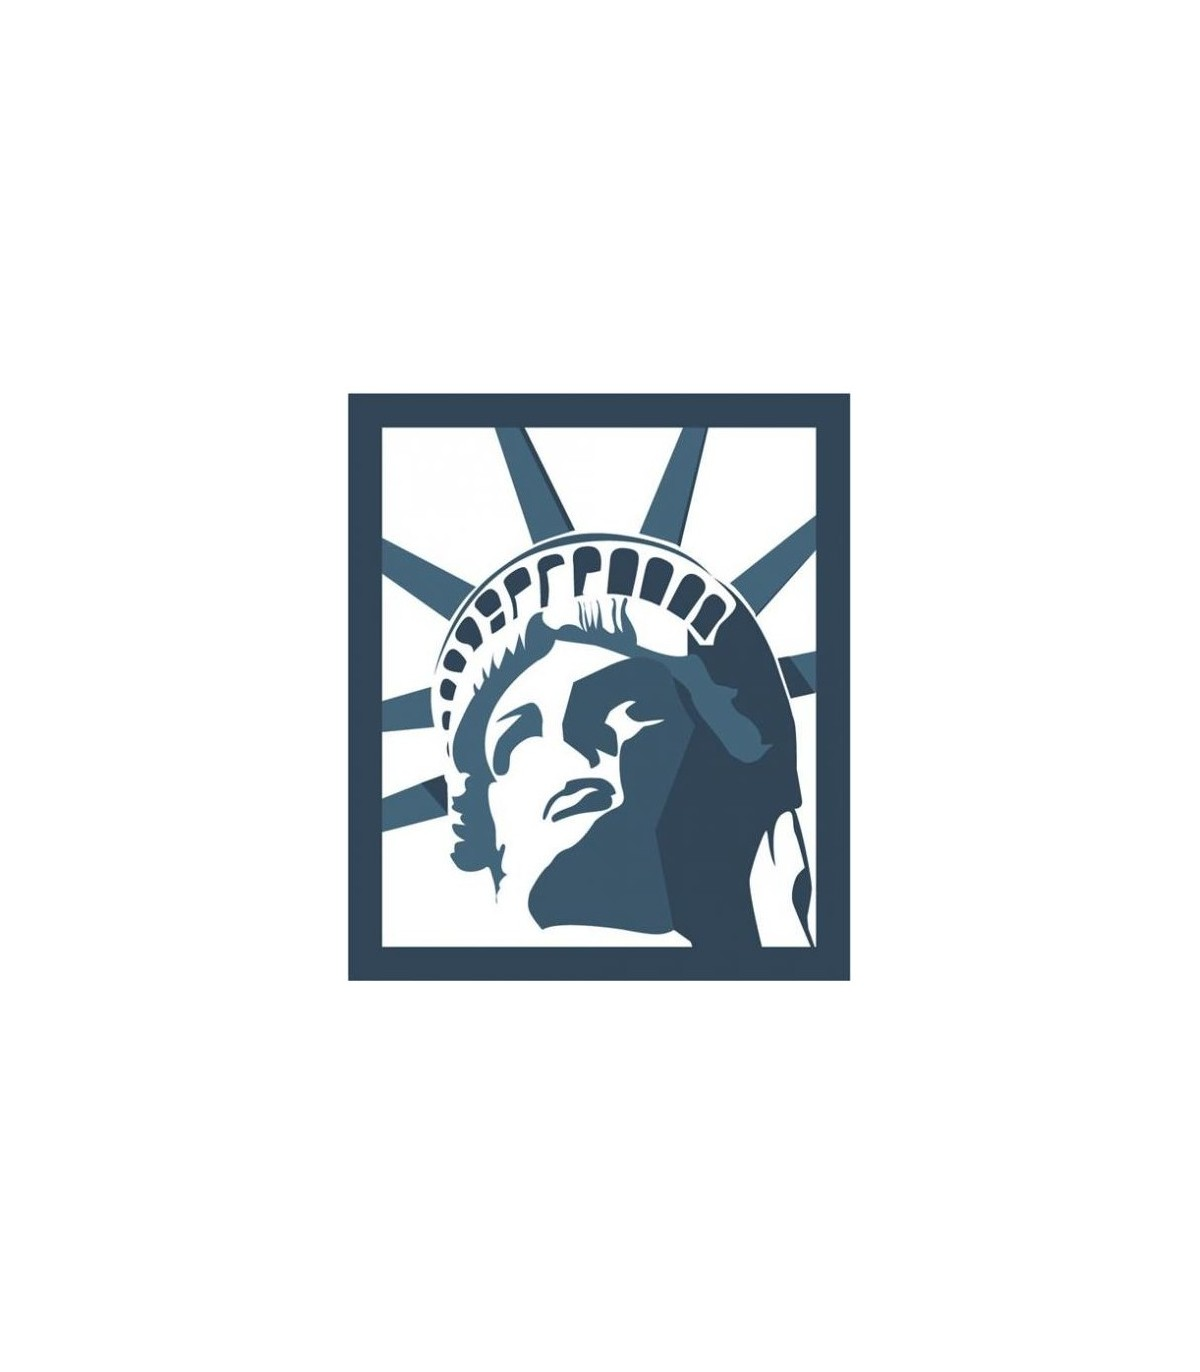 Sticker liberte